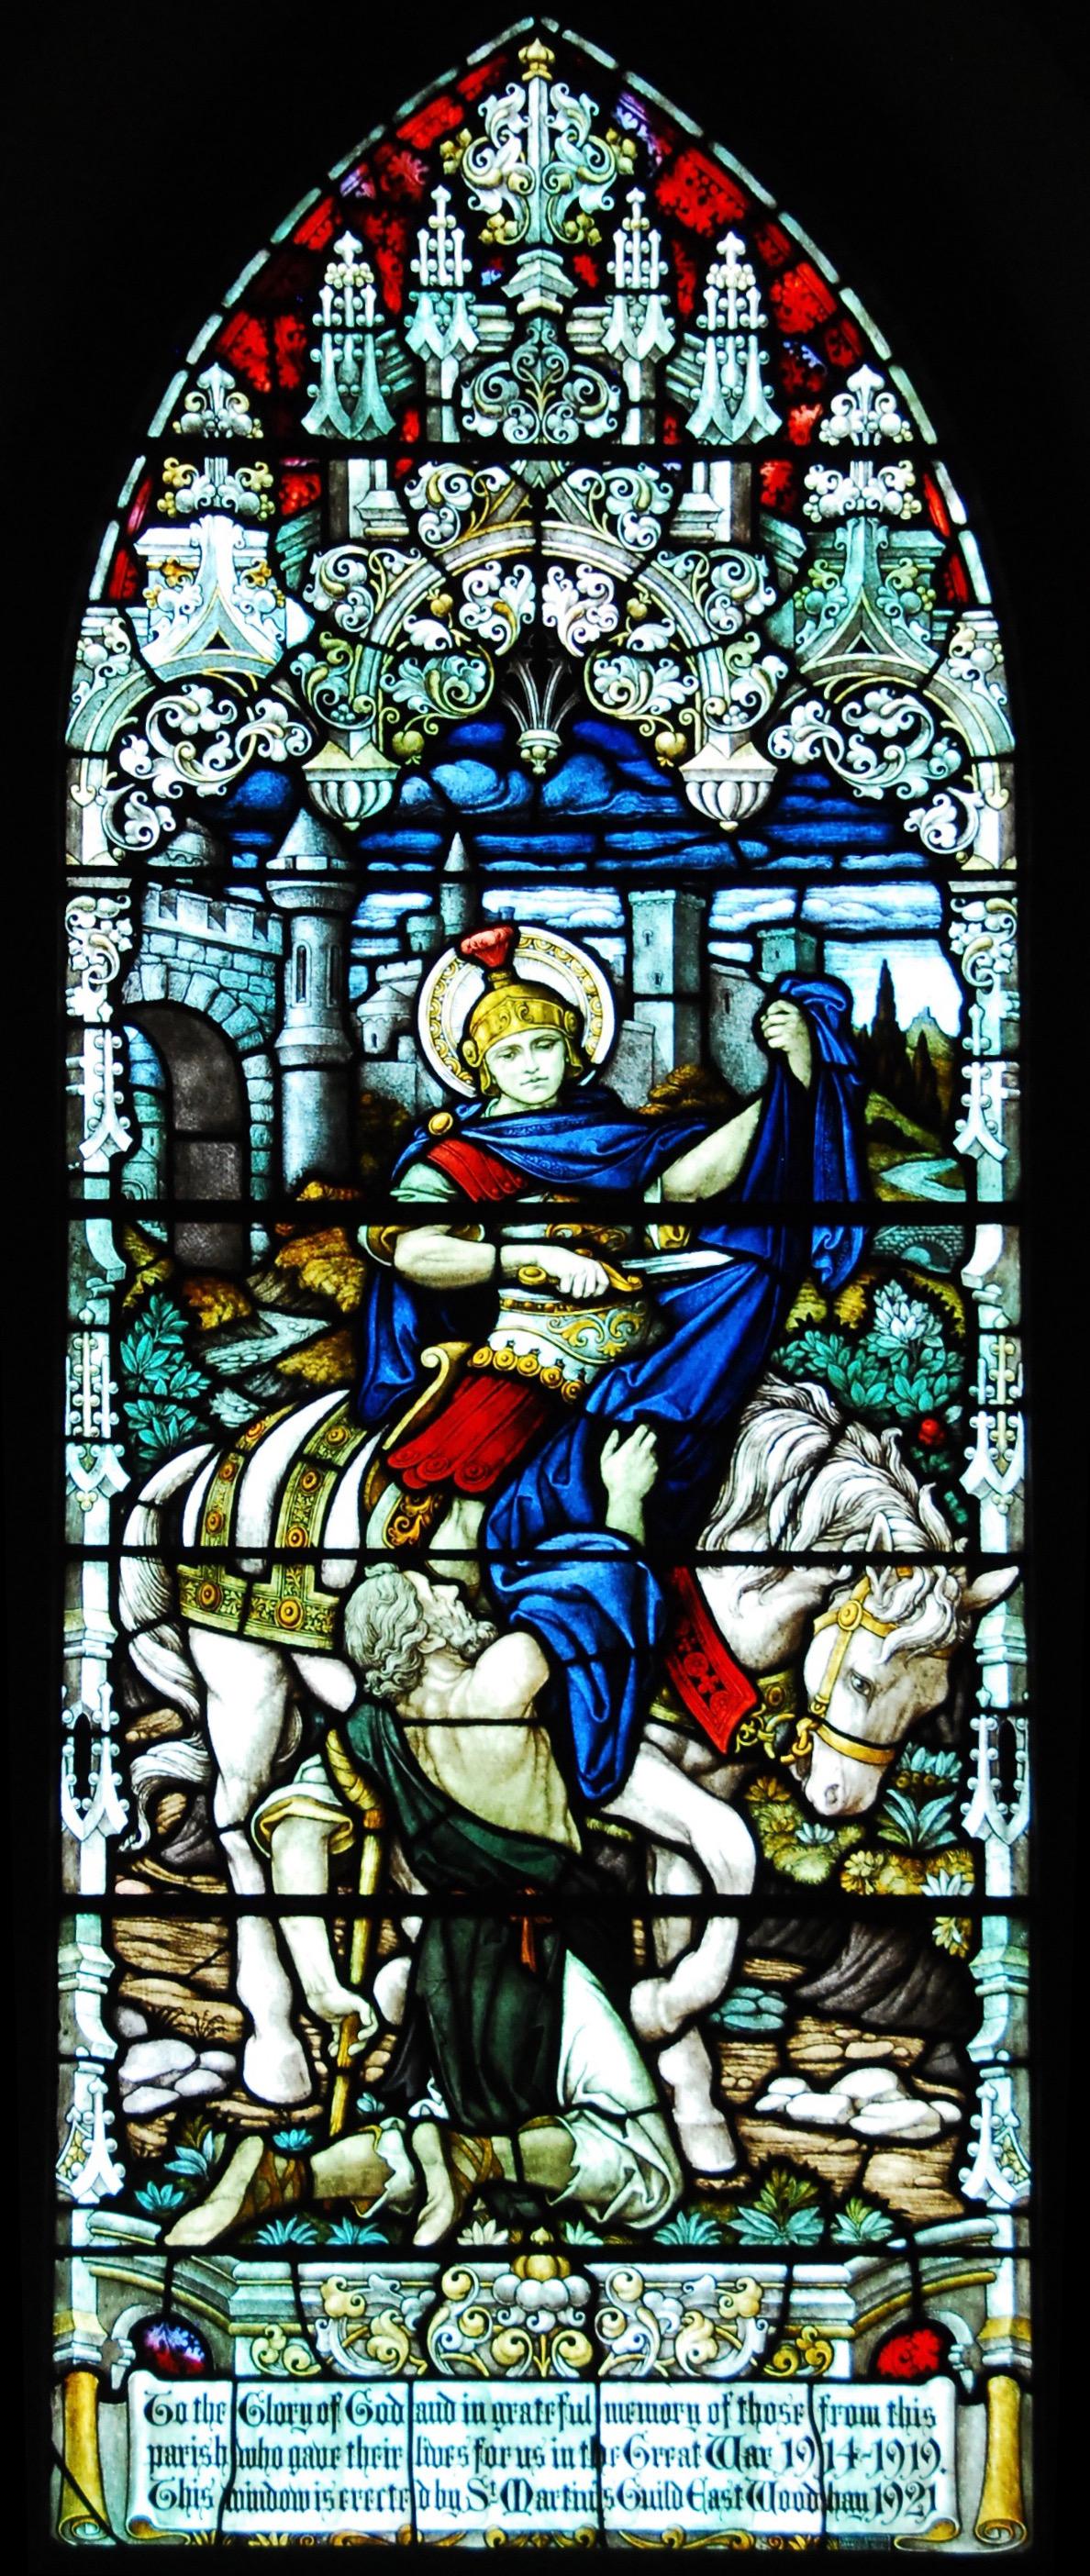 The St Martin's Guild Window